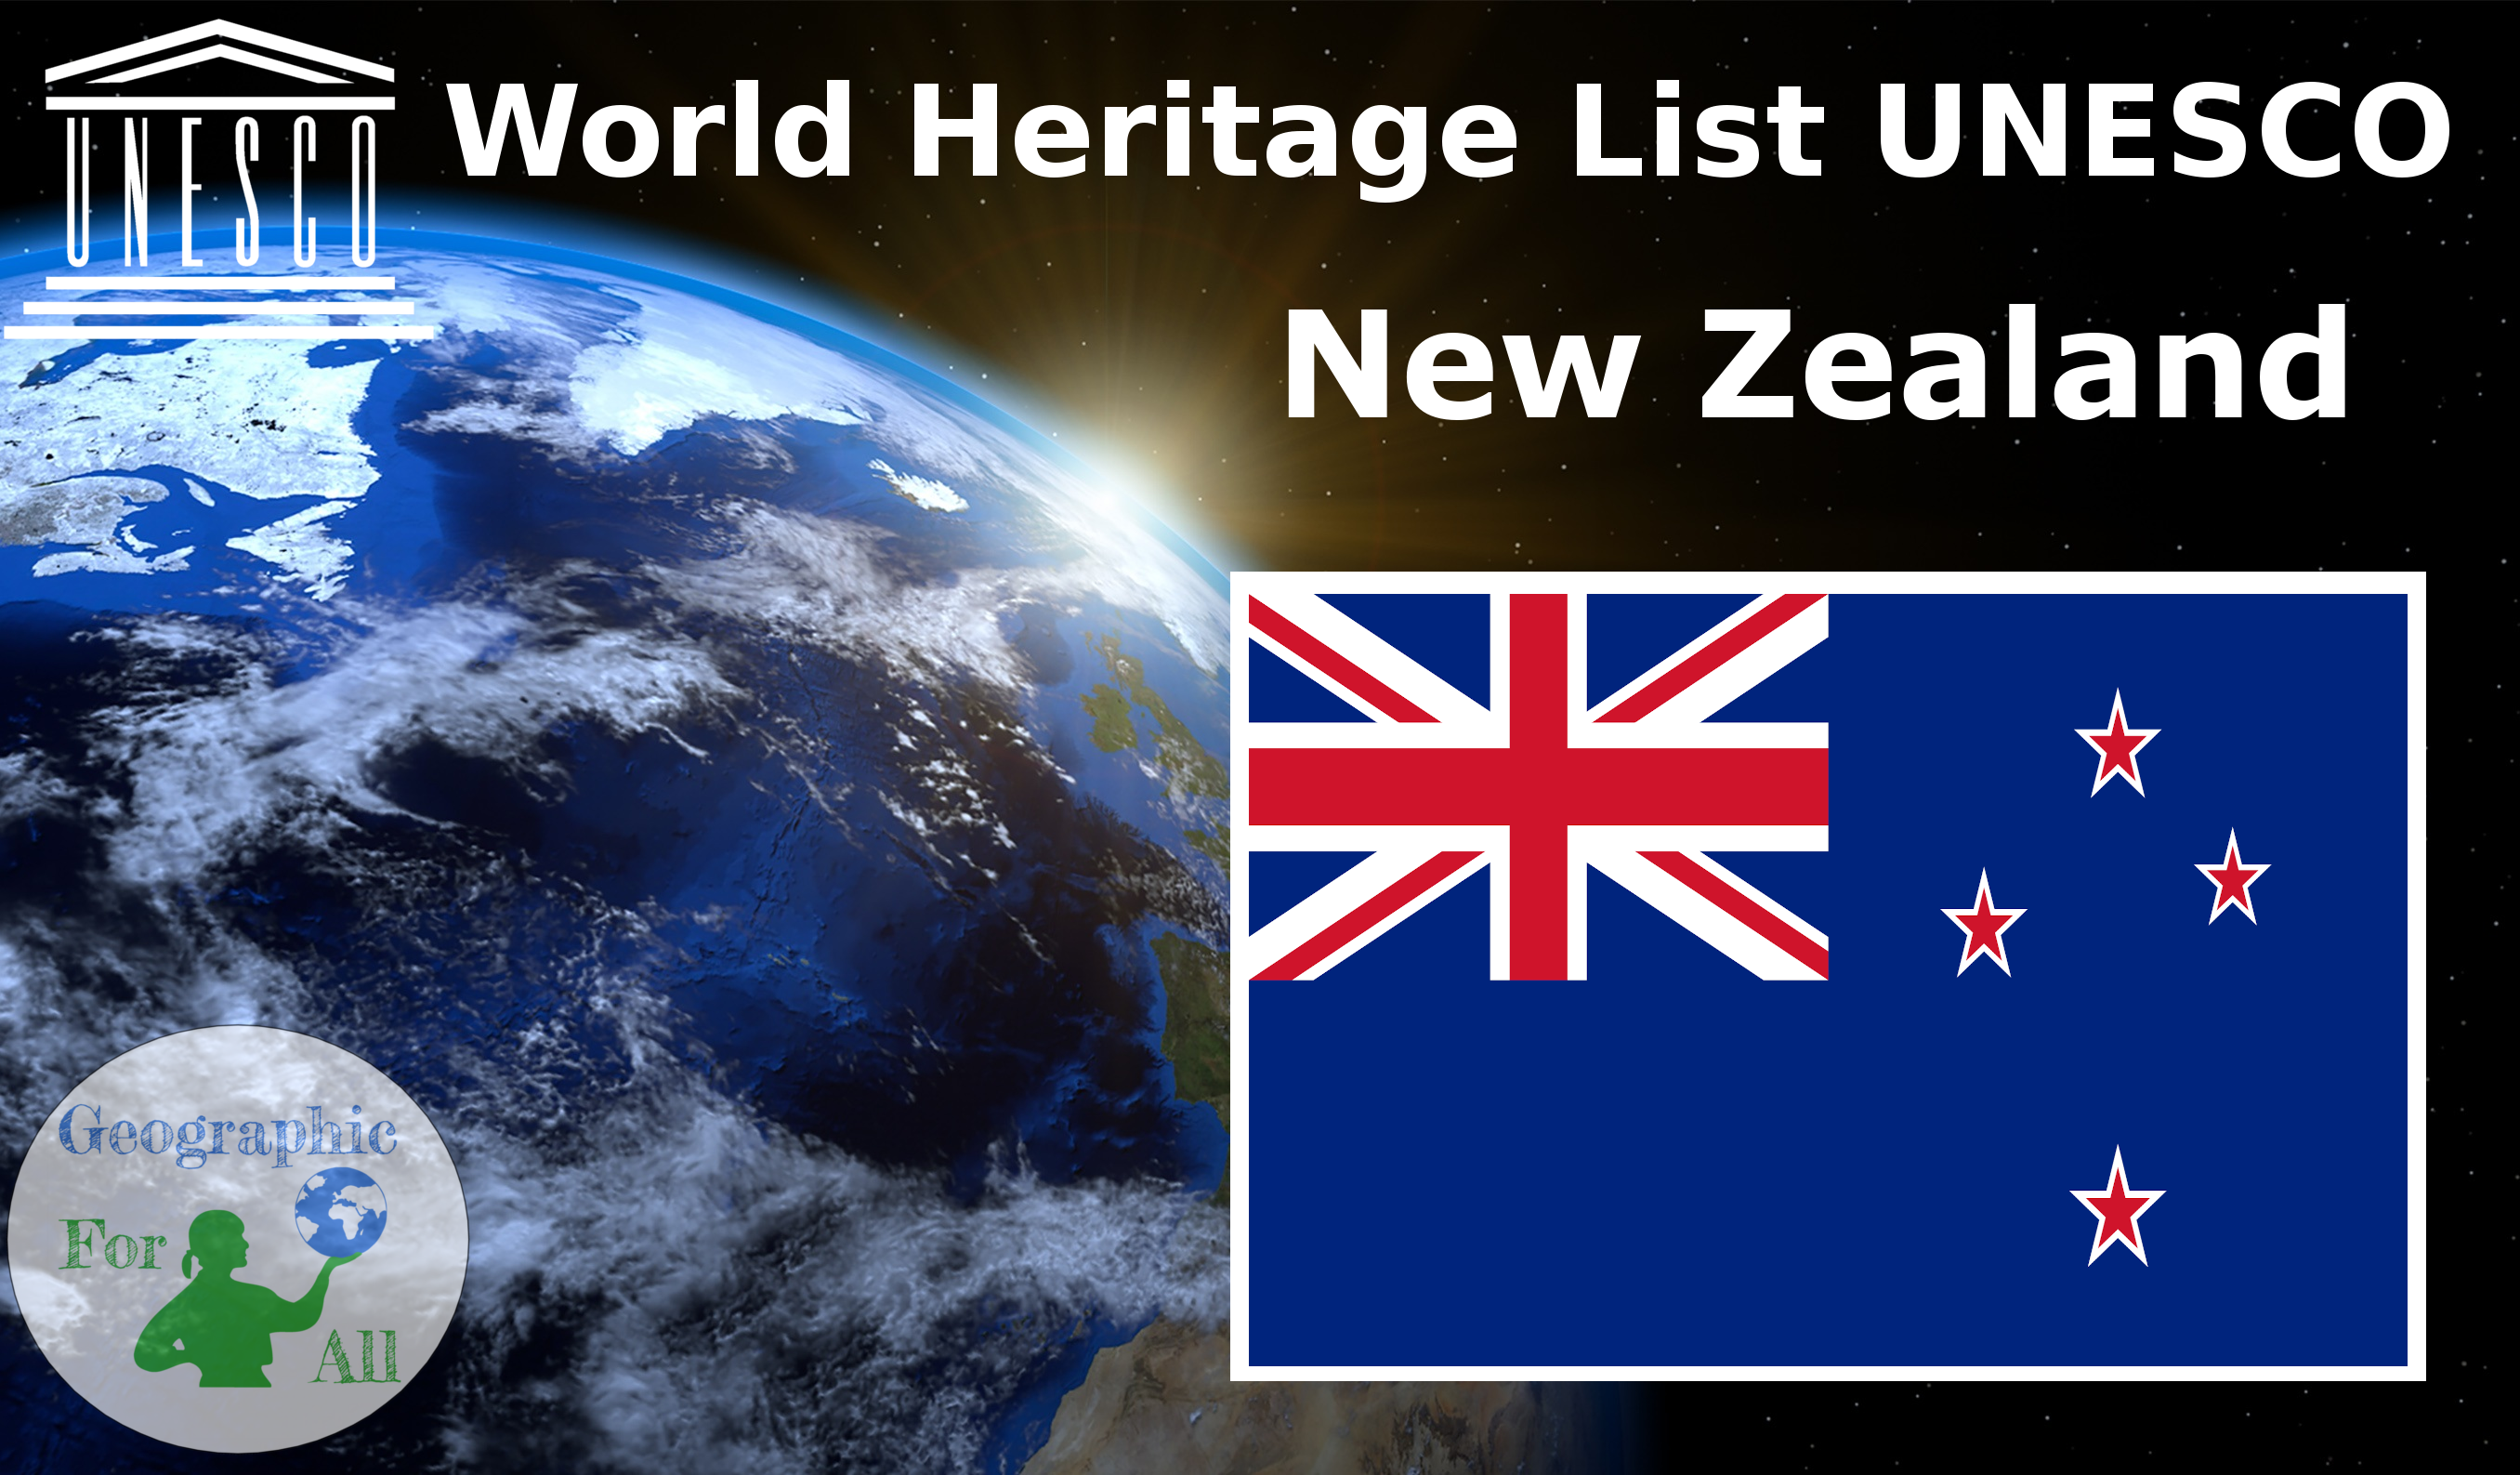 World Heritage List UNESCO - New Zealand